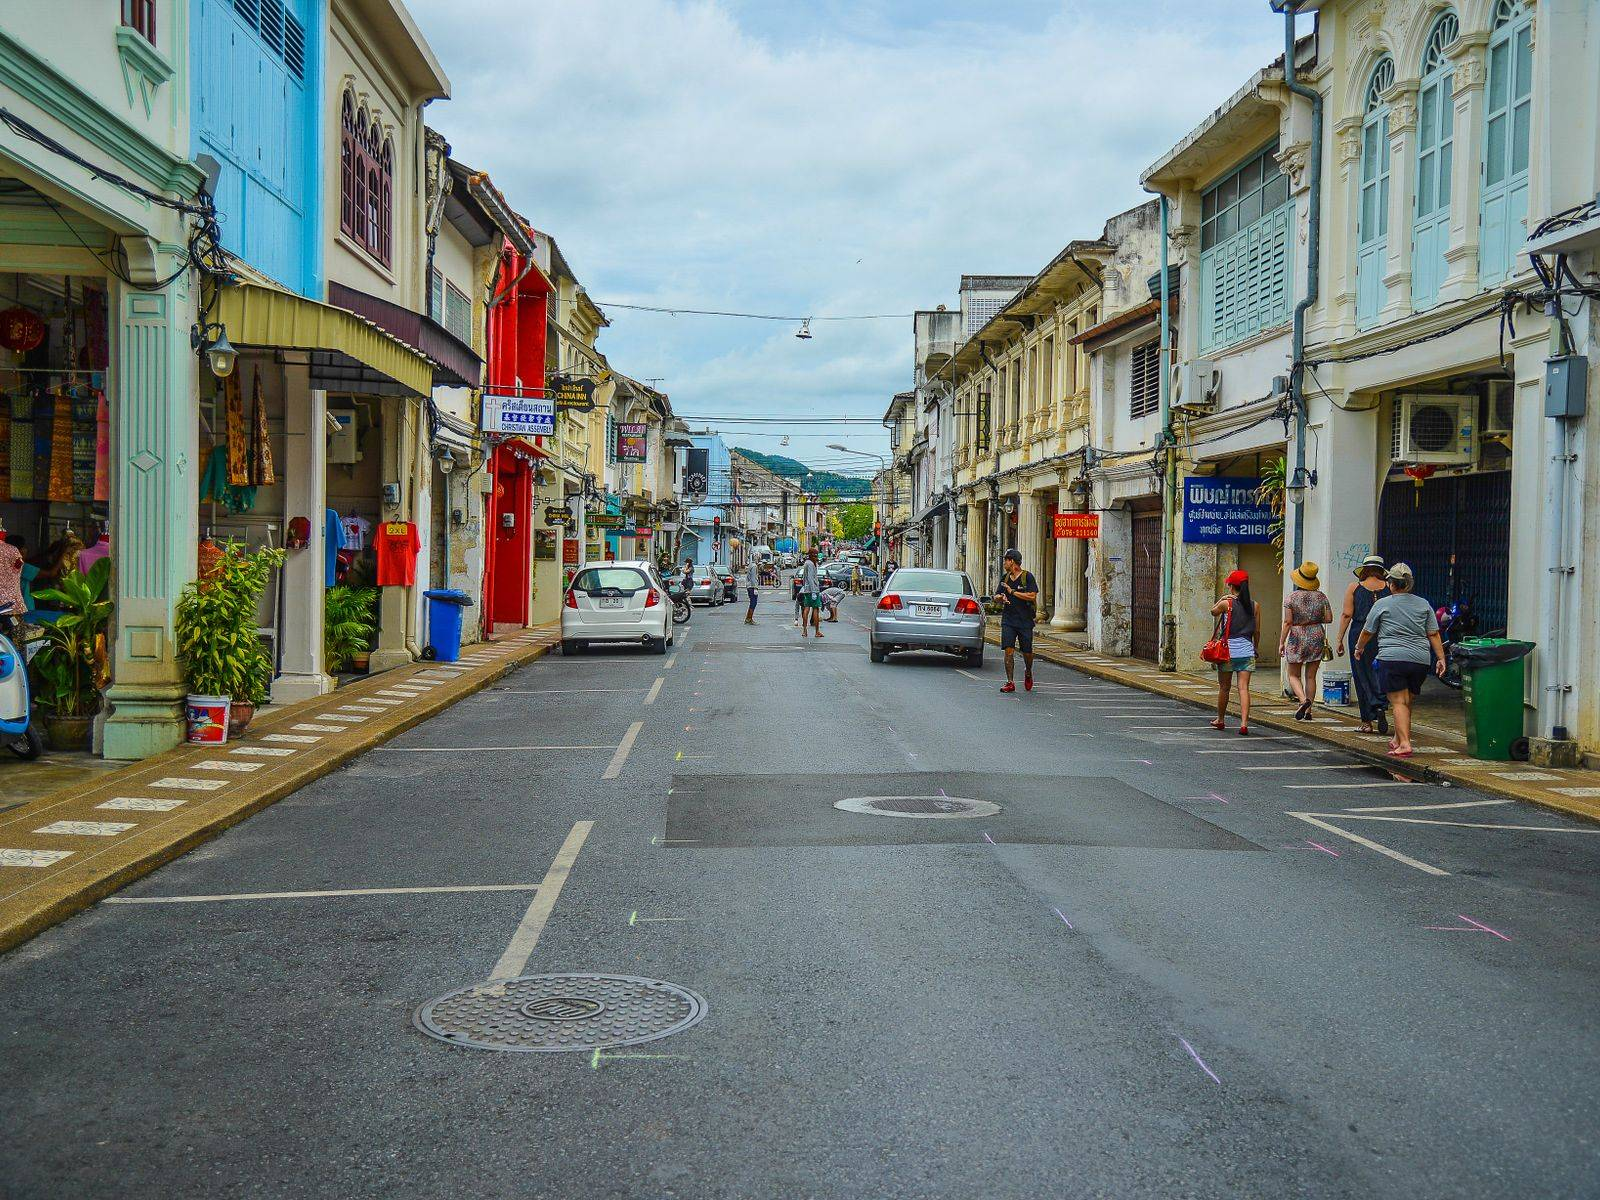 Dusit's Local Experiences in Phuket